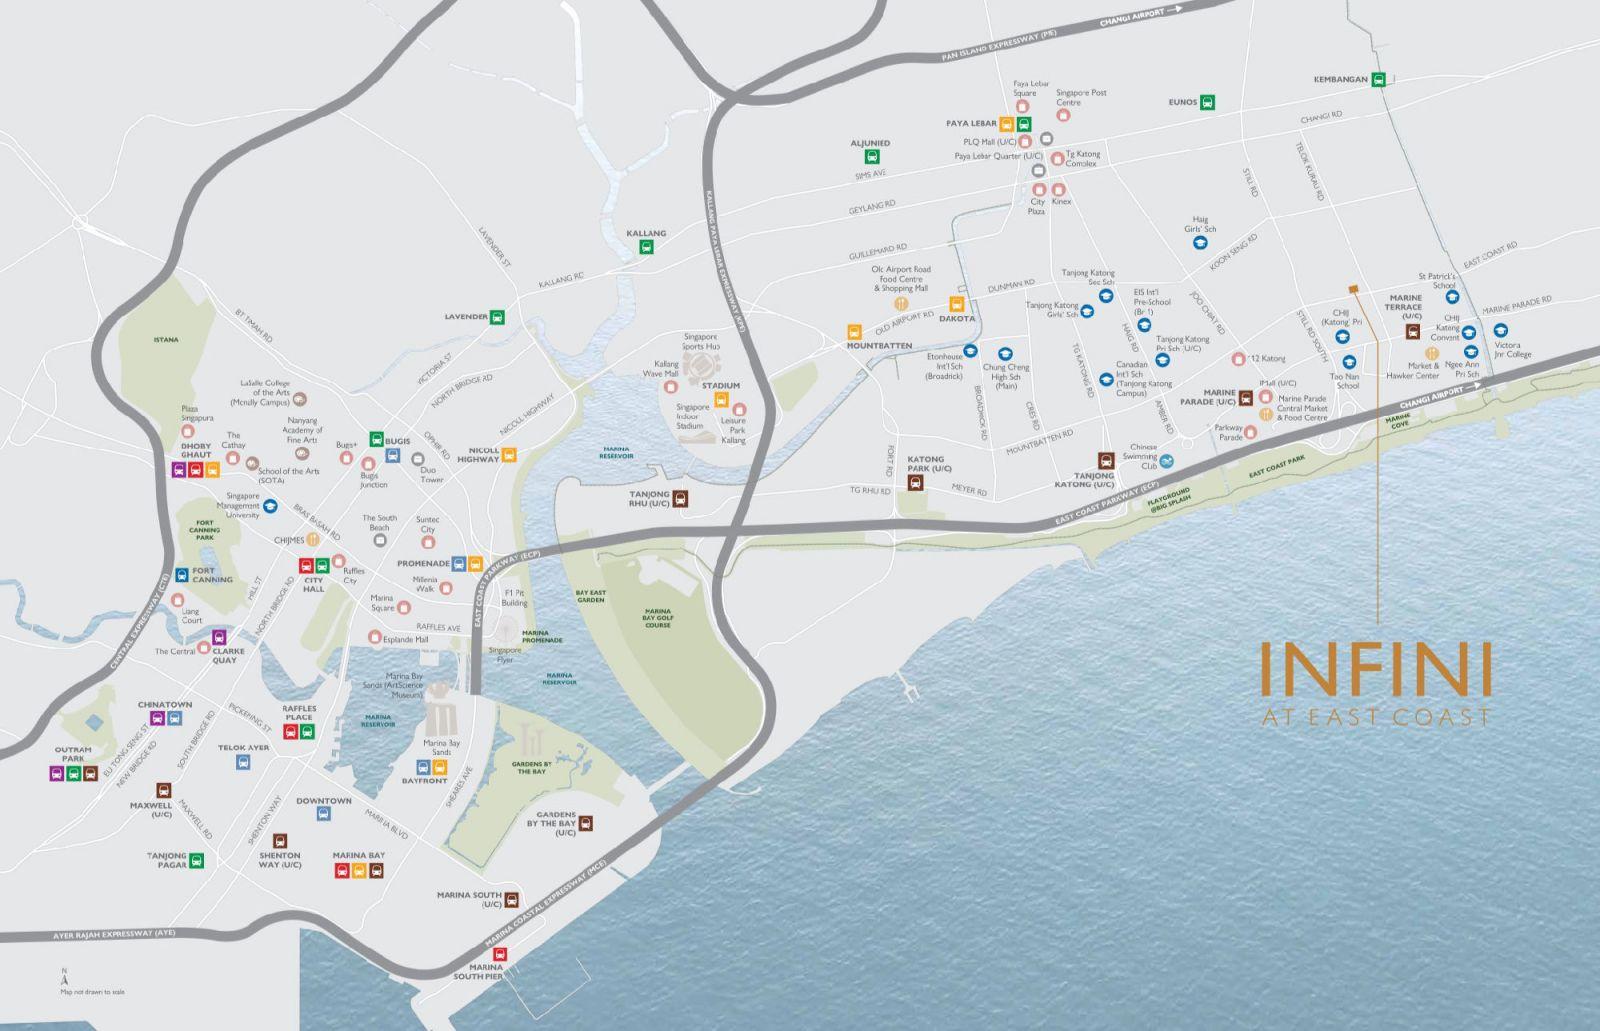 Infini at East Coast